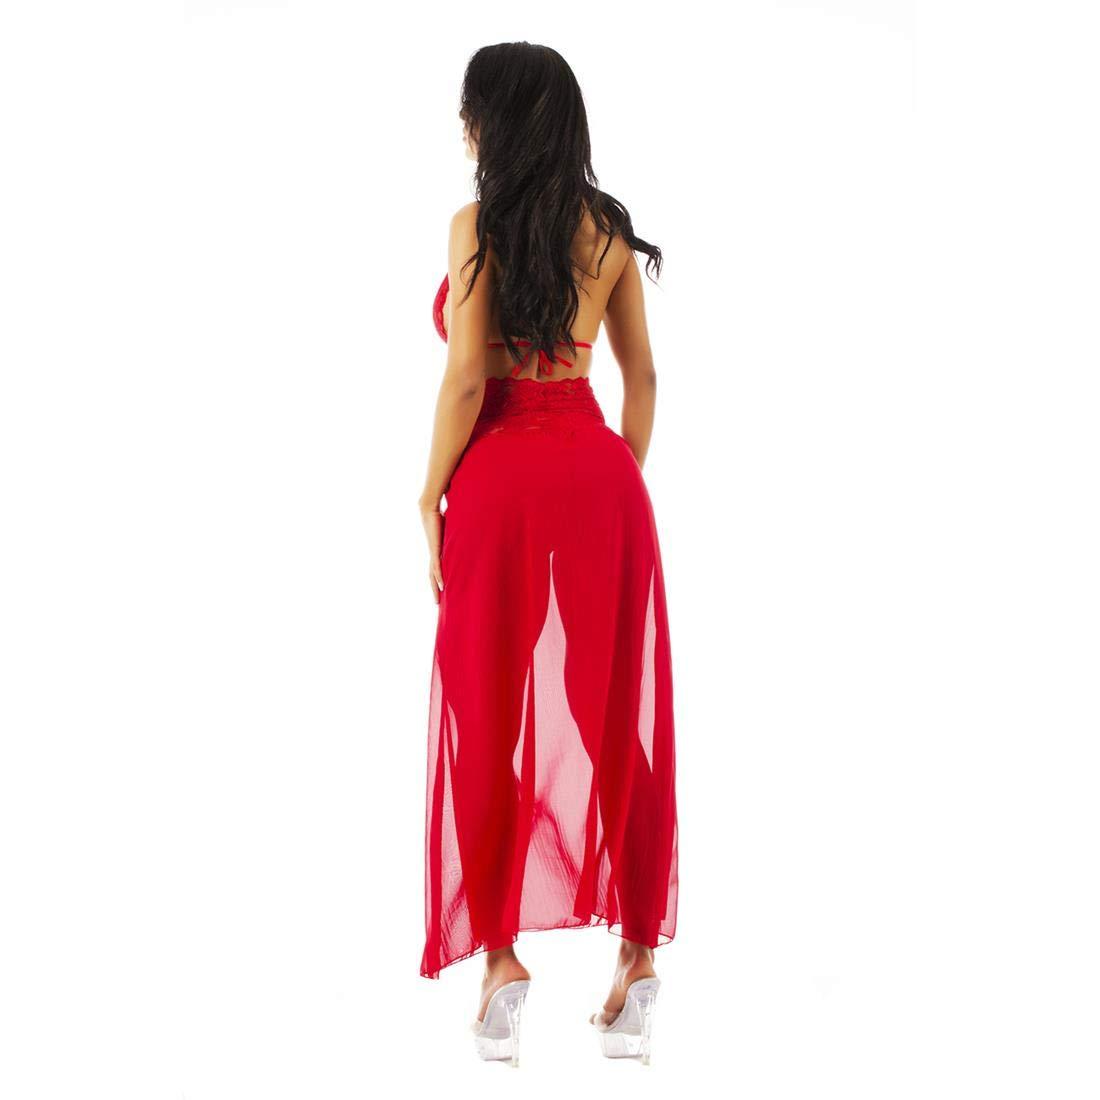 2dfa55552 Camisola Sensual Renda Longa Pimenta Sexy Vermelha - Camisola Sexy   Amazon.com.br  hpc